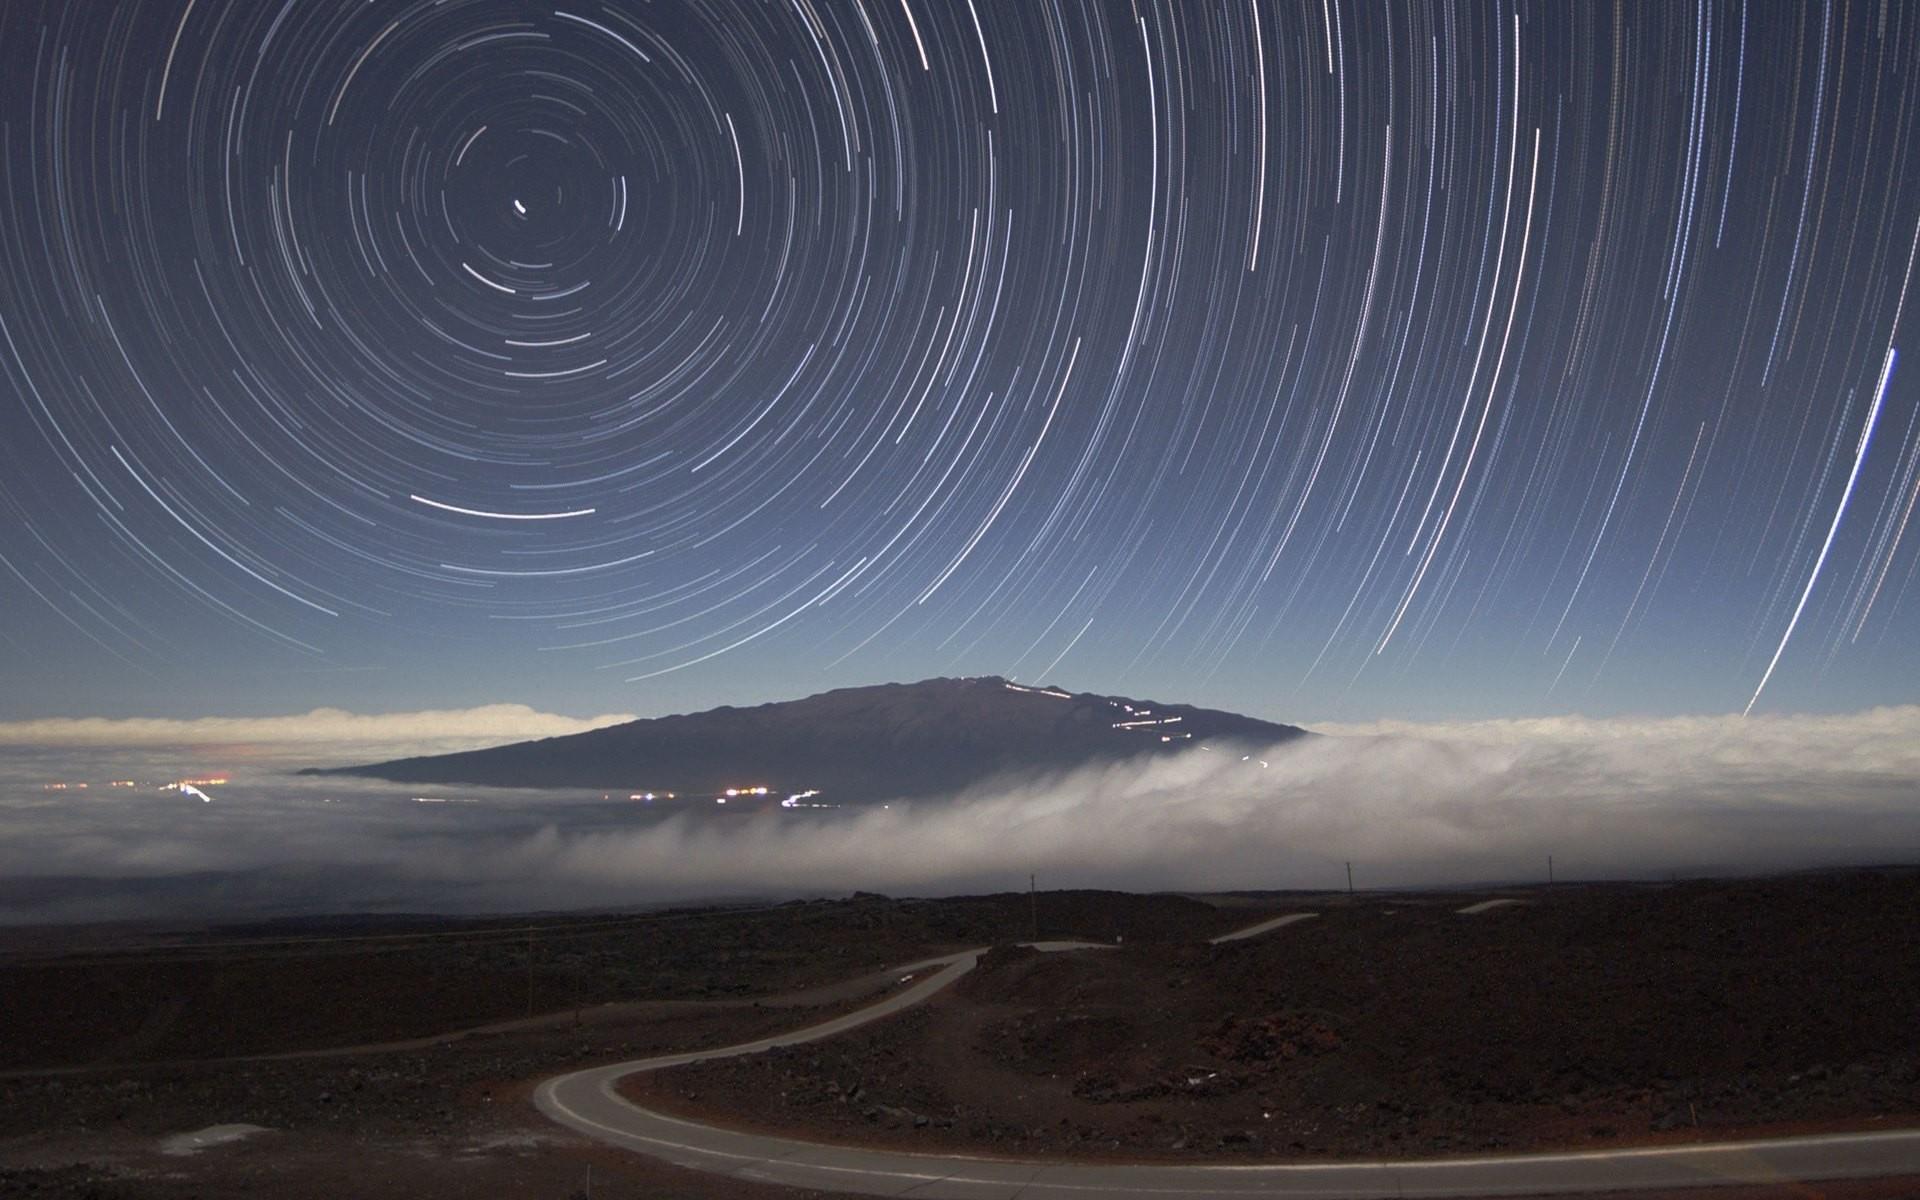 َشناسایی کوچکترین ستاره کیهان